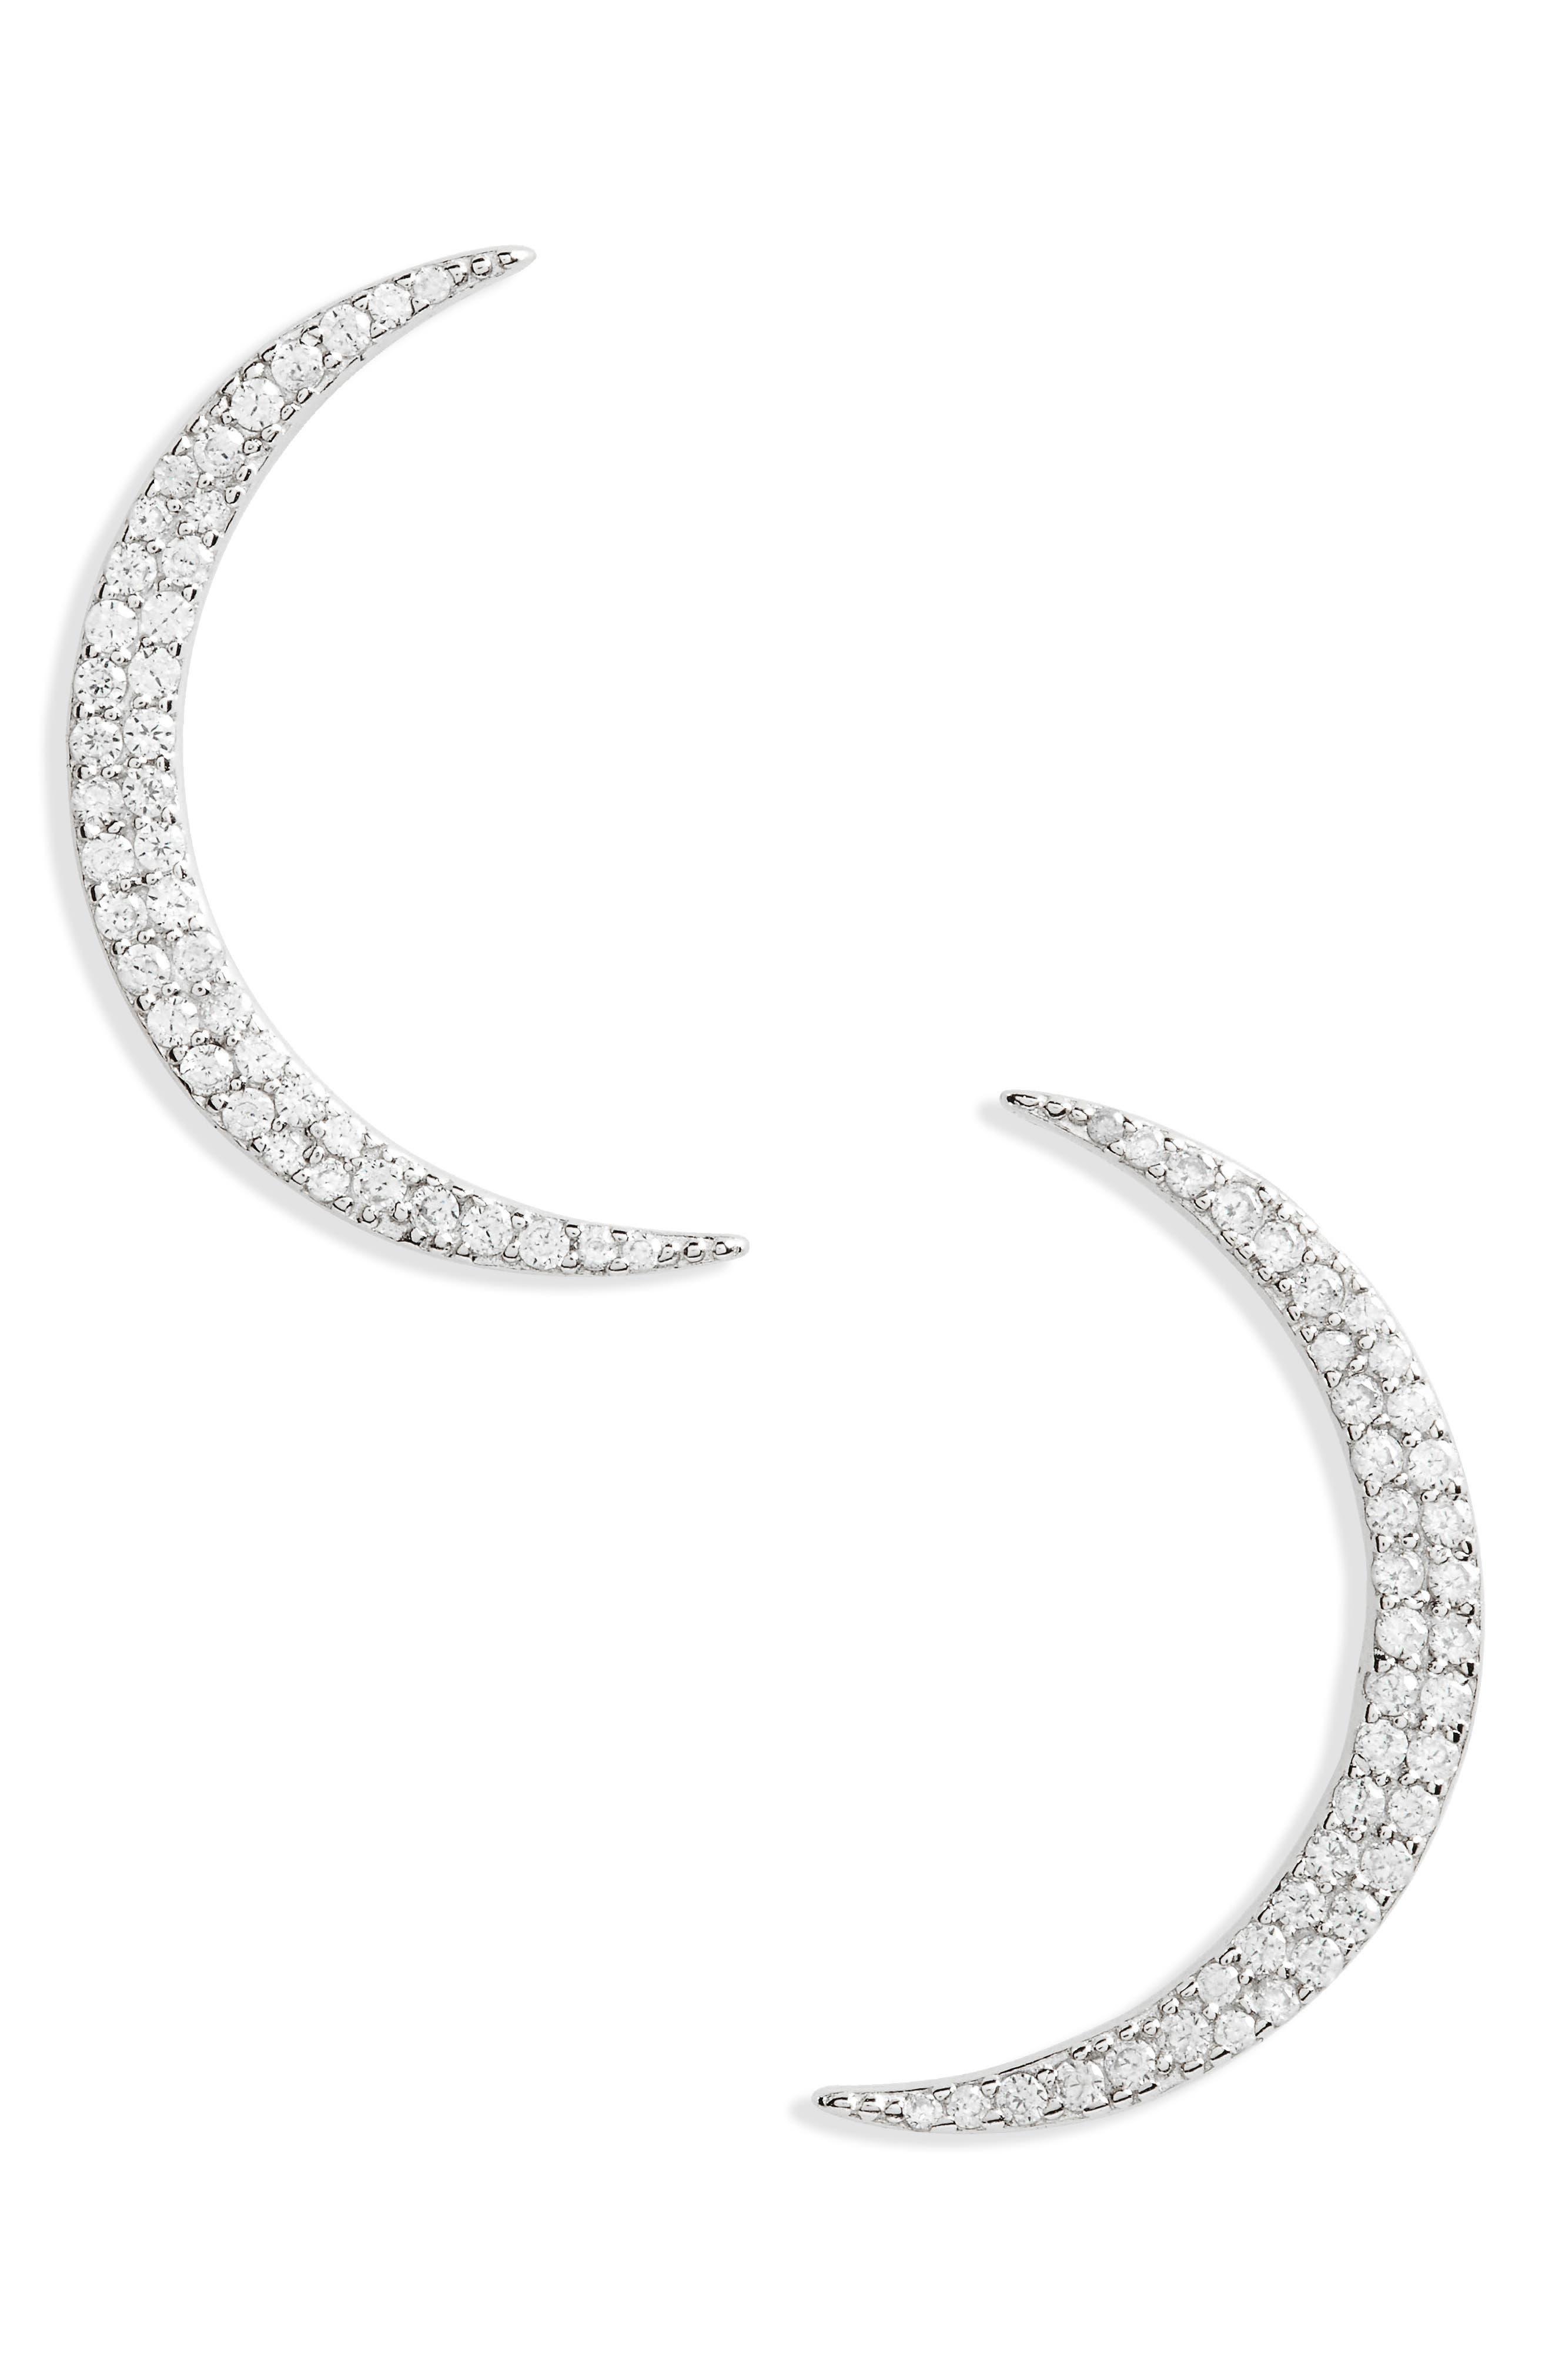 Shashi Pavé Crescent Earrings